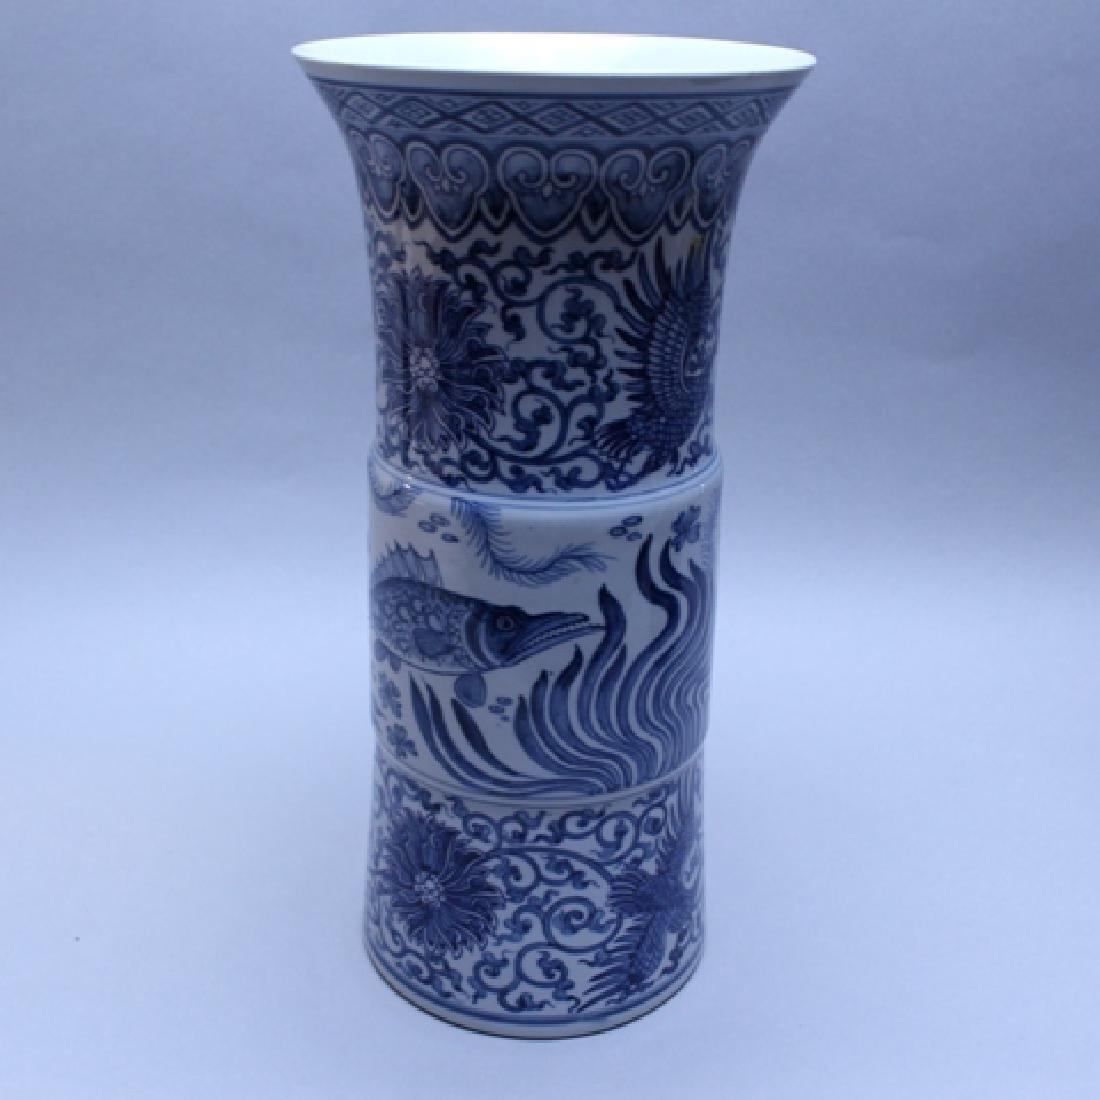 Decorative Blue and White Porcelain Gu Vase - 5